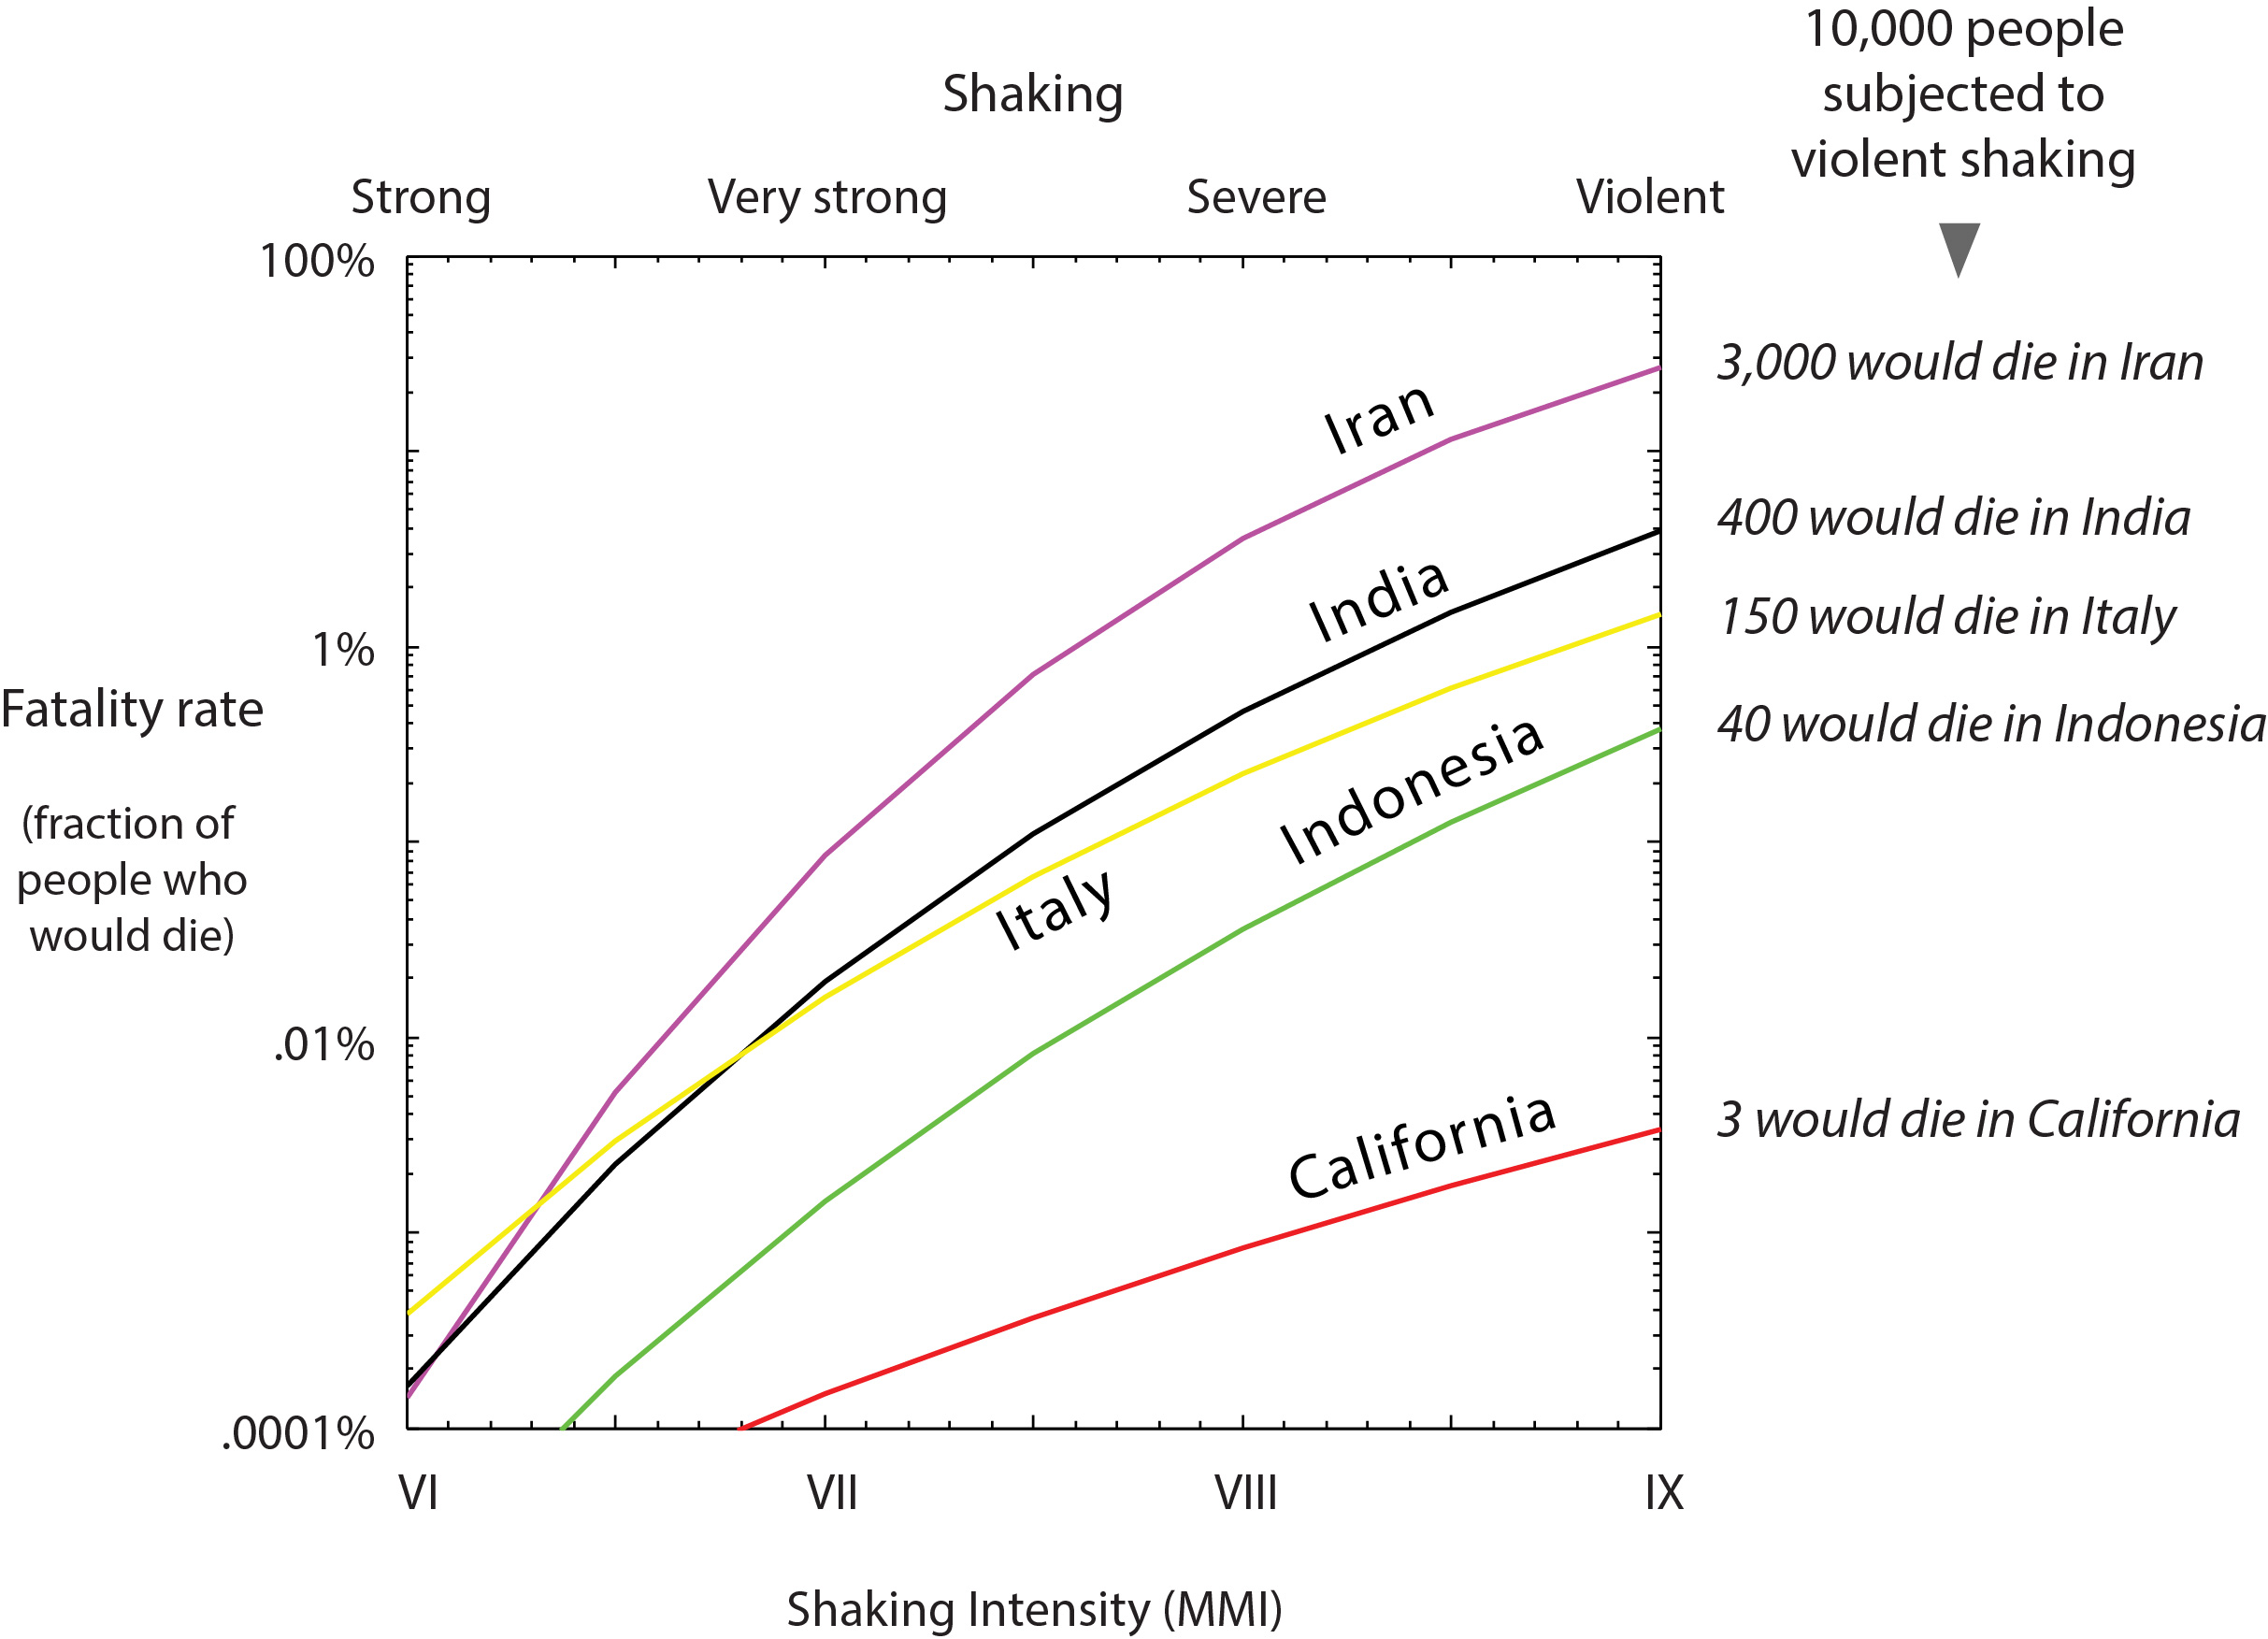 jaiswal-wald-2010-empirical-model-without-greece-japan